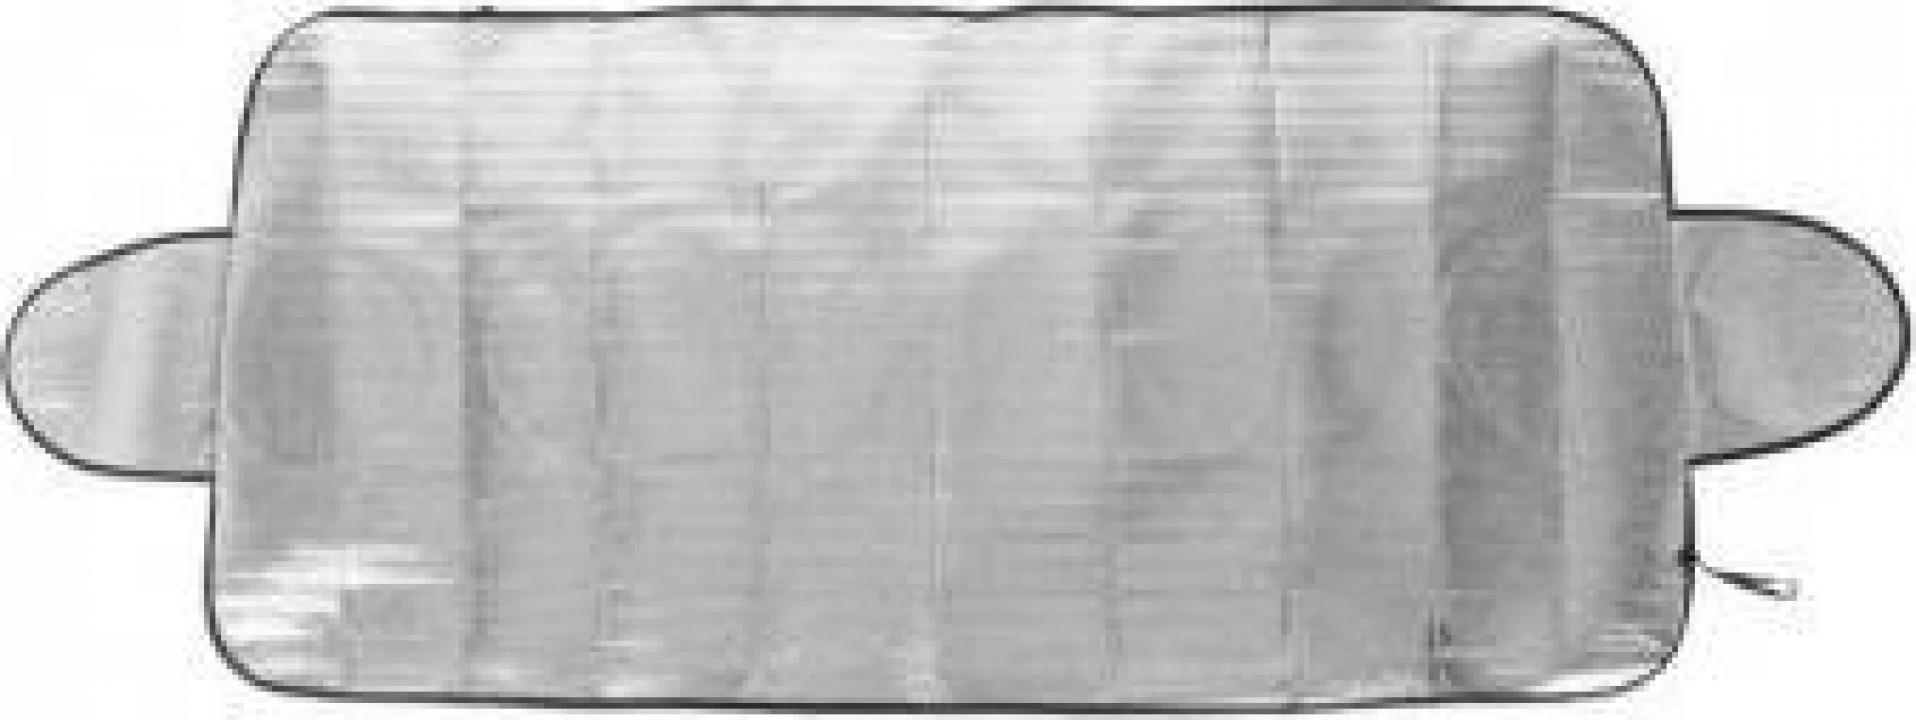 Parasolar parbriz, Strend Pro Alu 85x180 cm